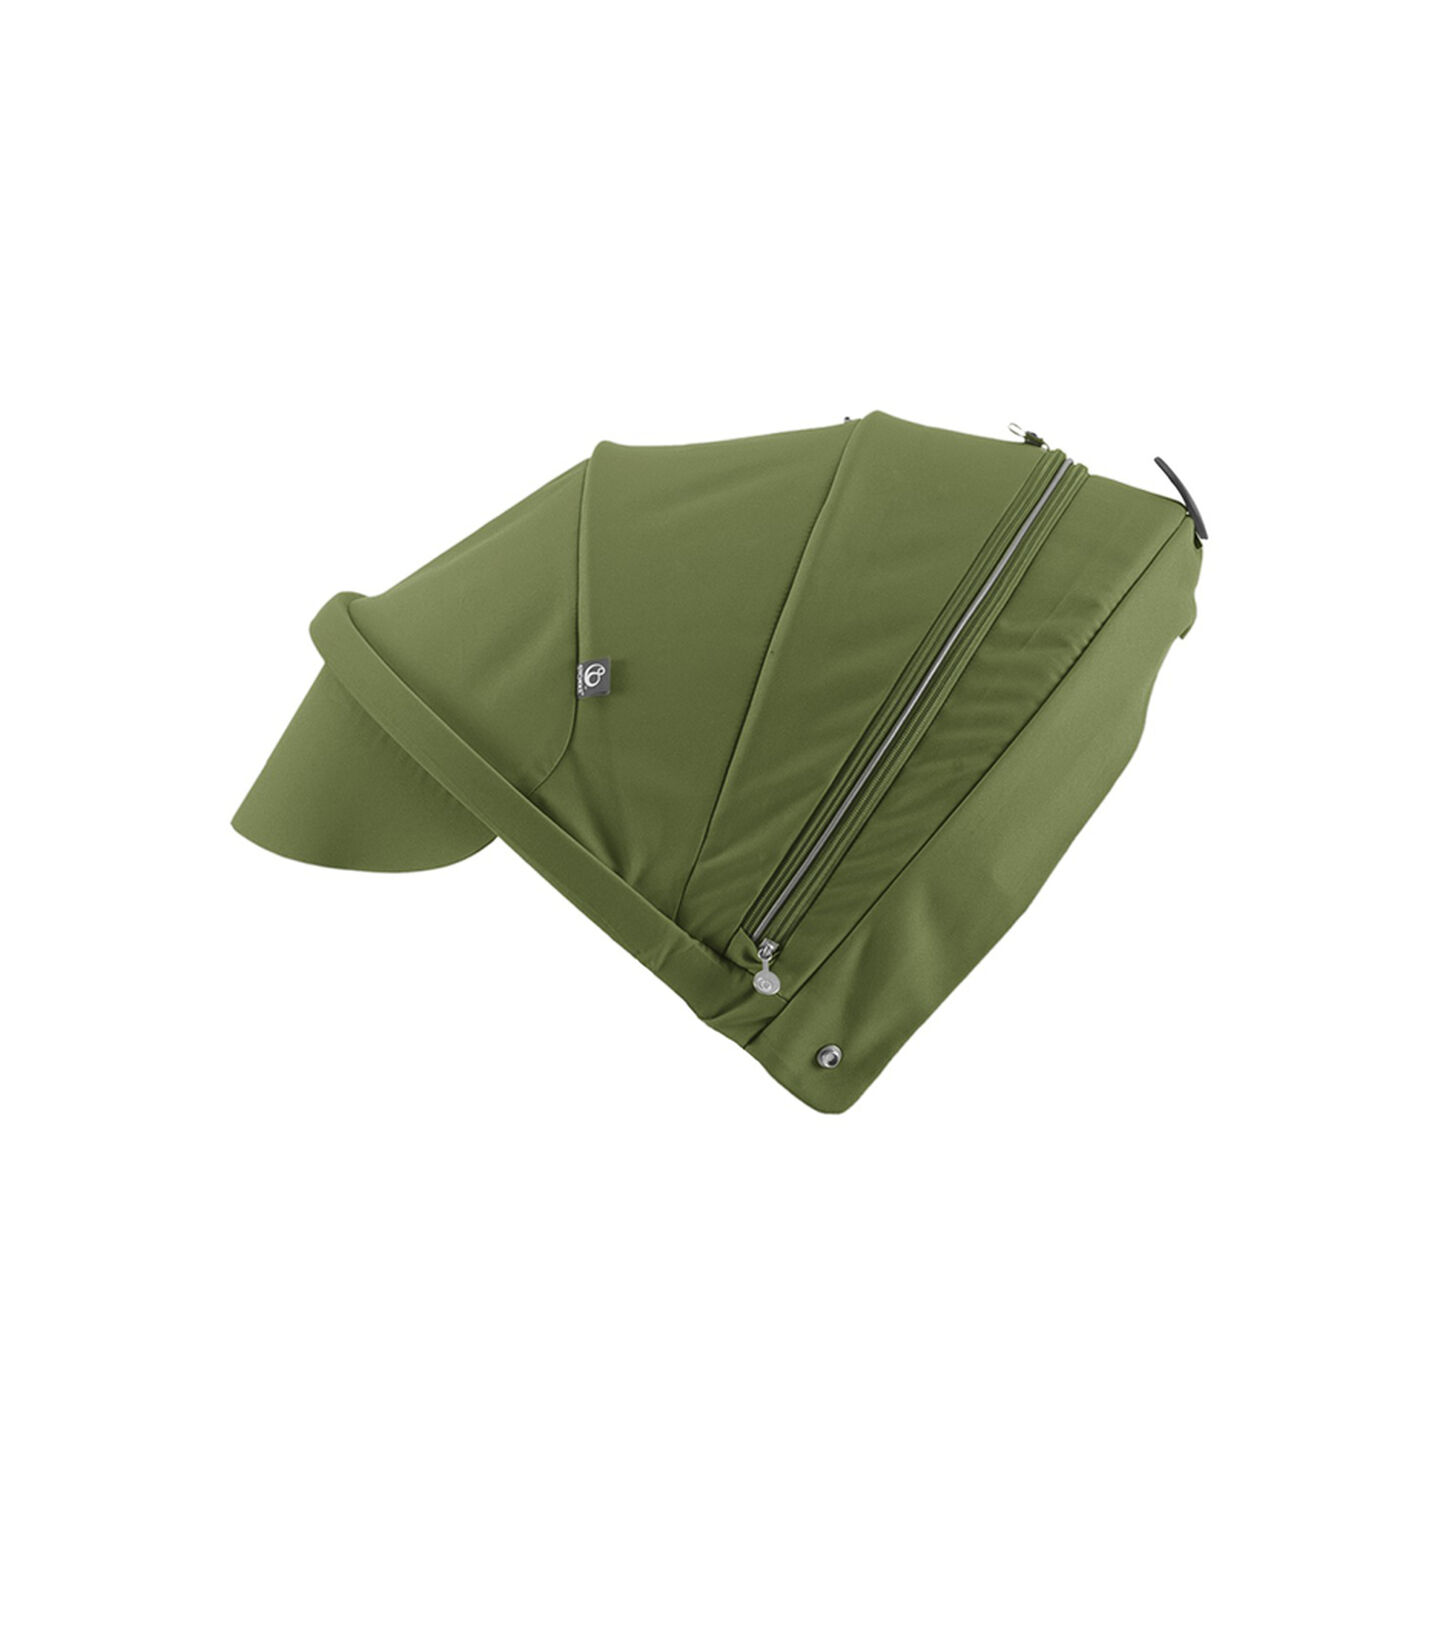 Stokke® Scoot™ kaleche grøn, Green, mainview view 2